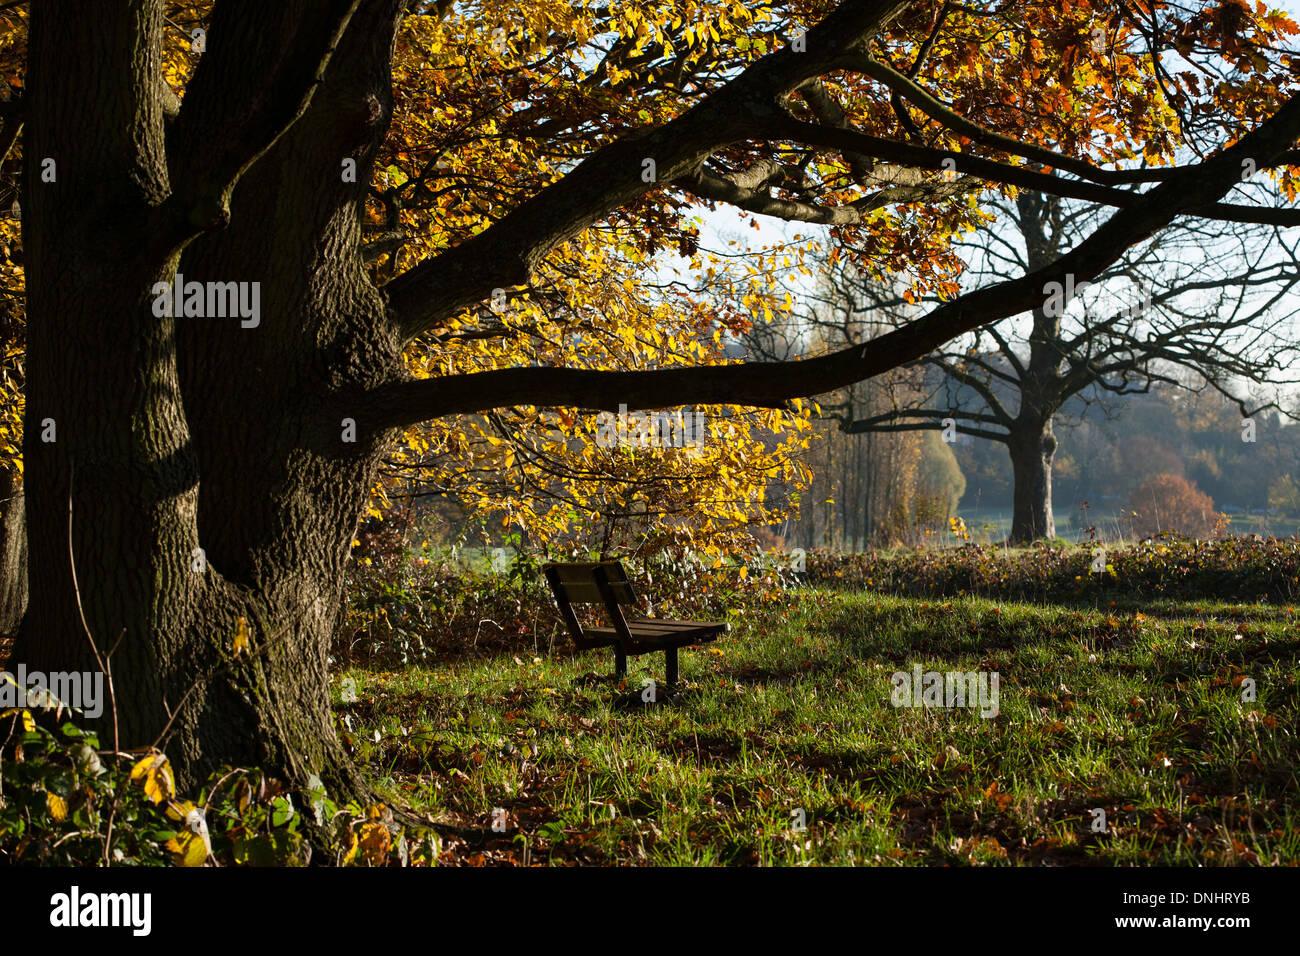 A park bench under an oak tree in Hampstead Heath. - Stock Image